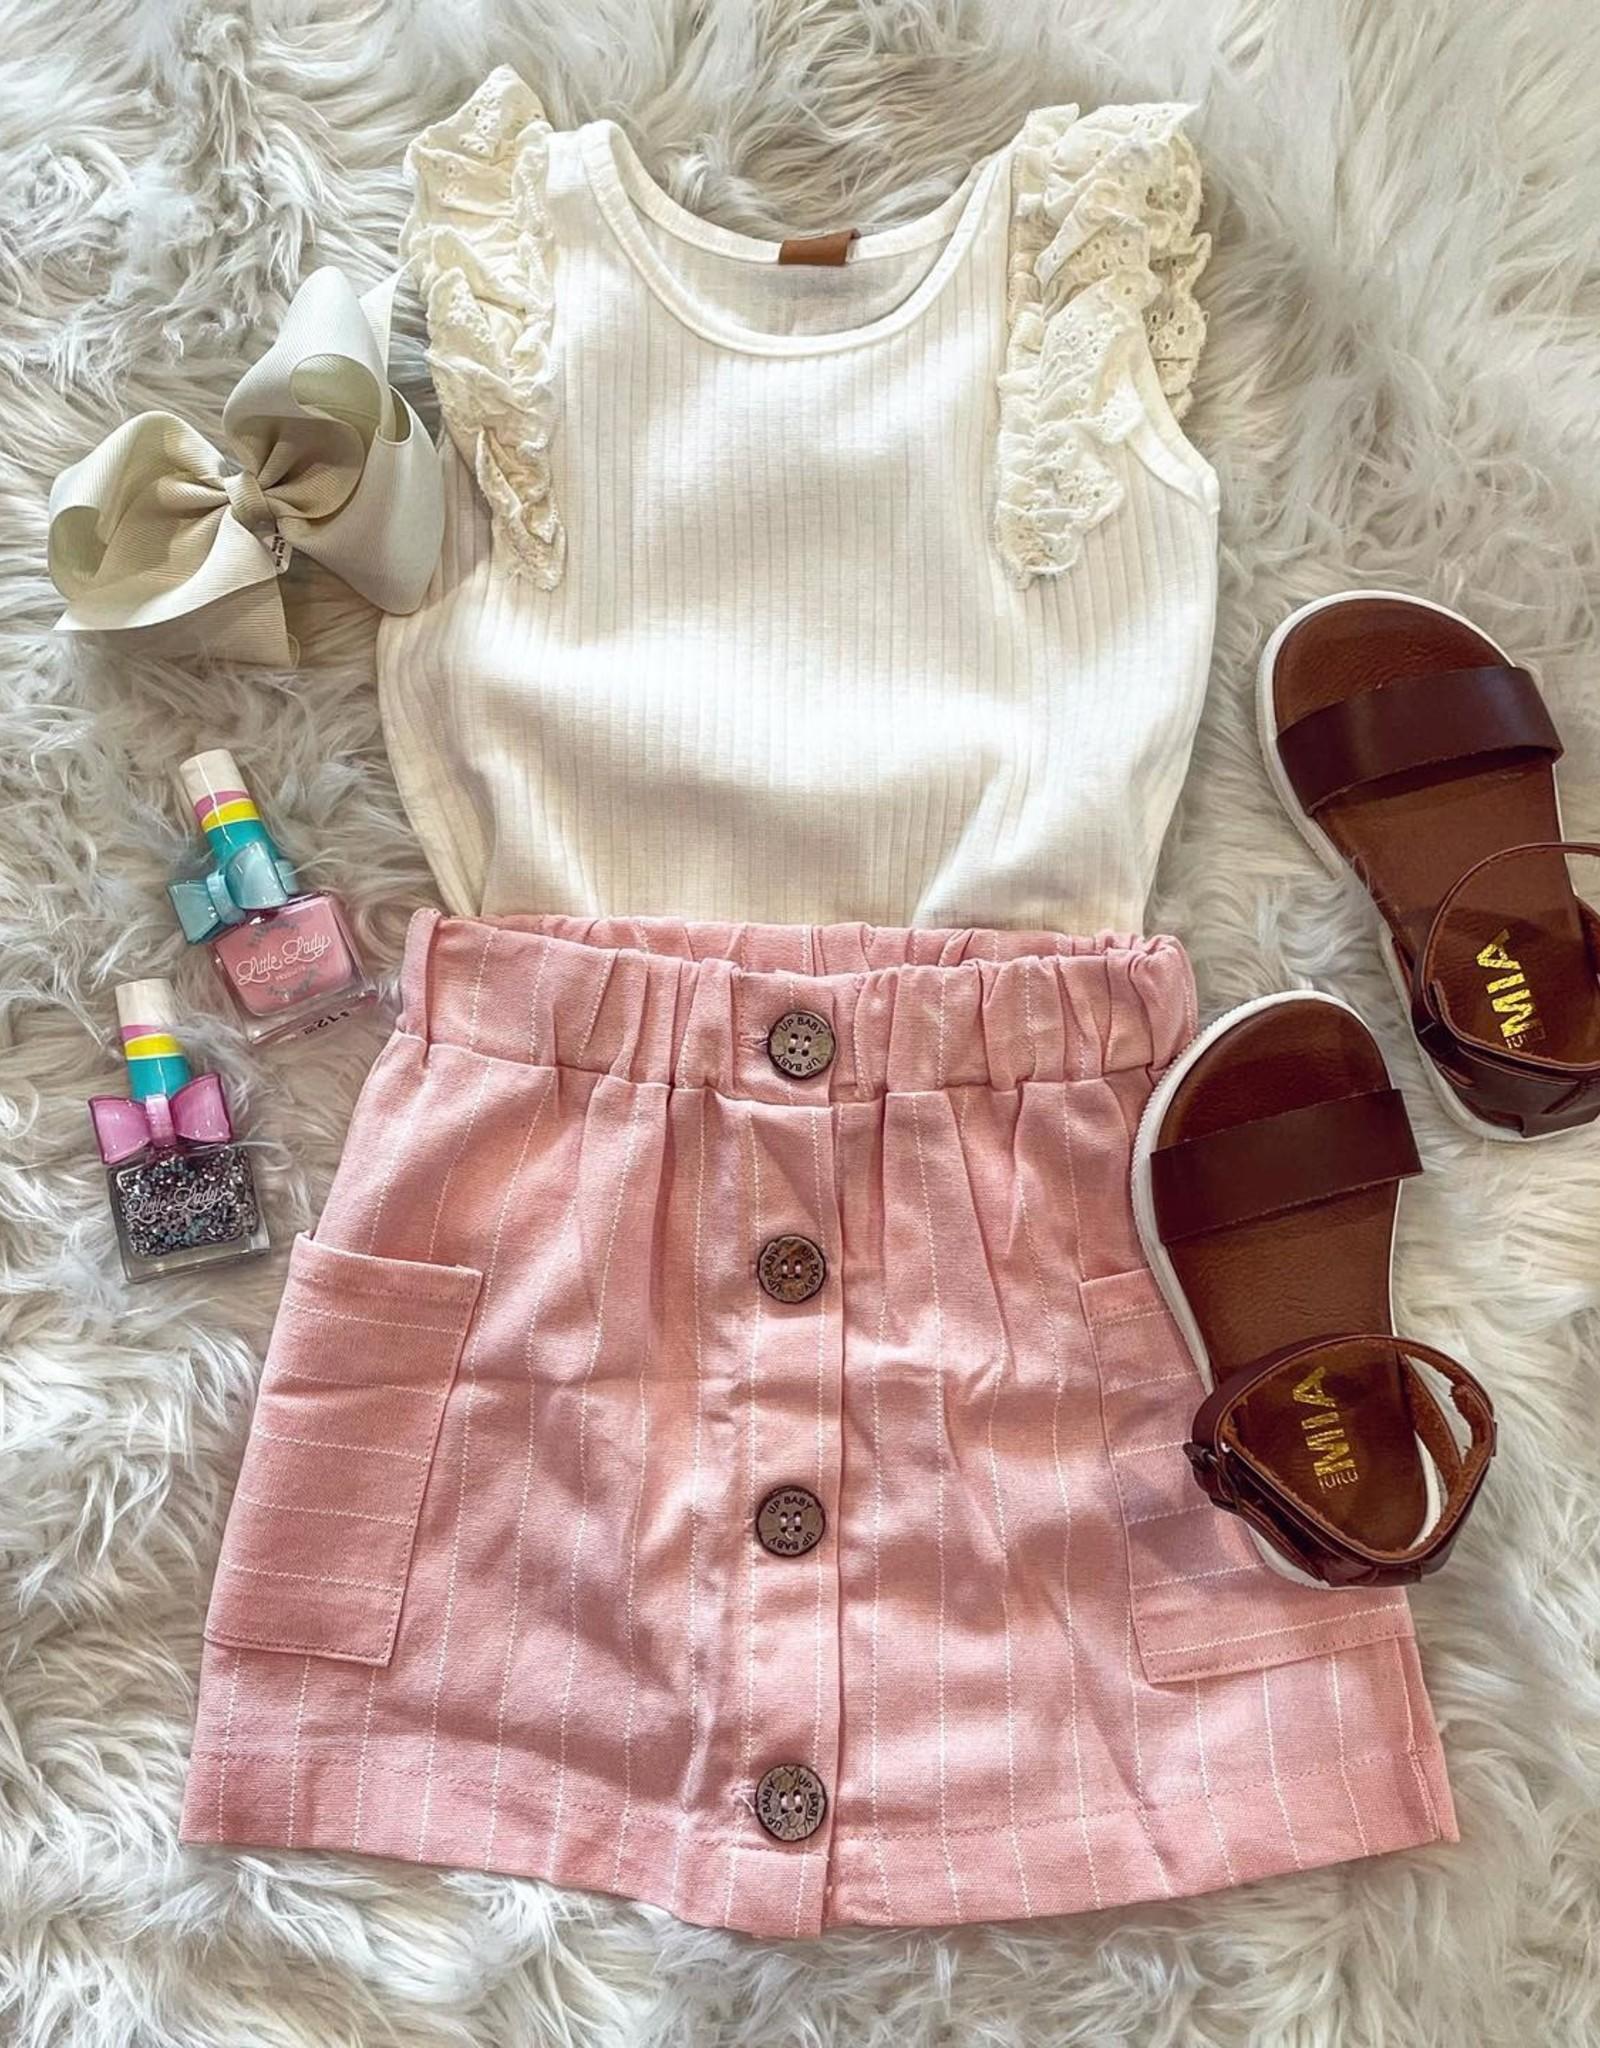 UpBaby Beth Skirt Set in Blush